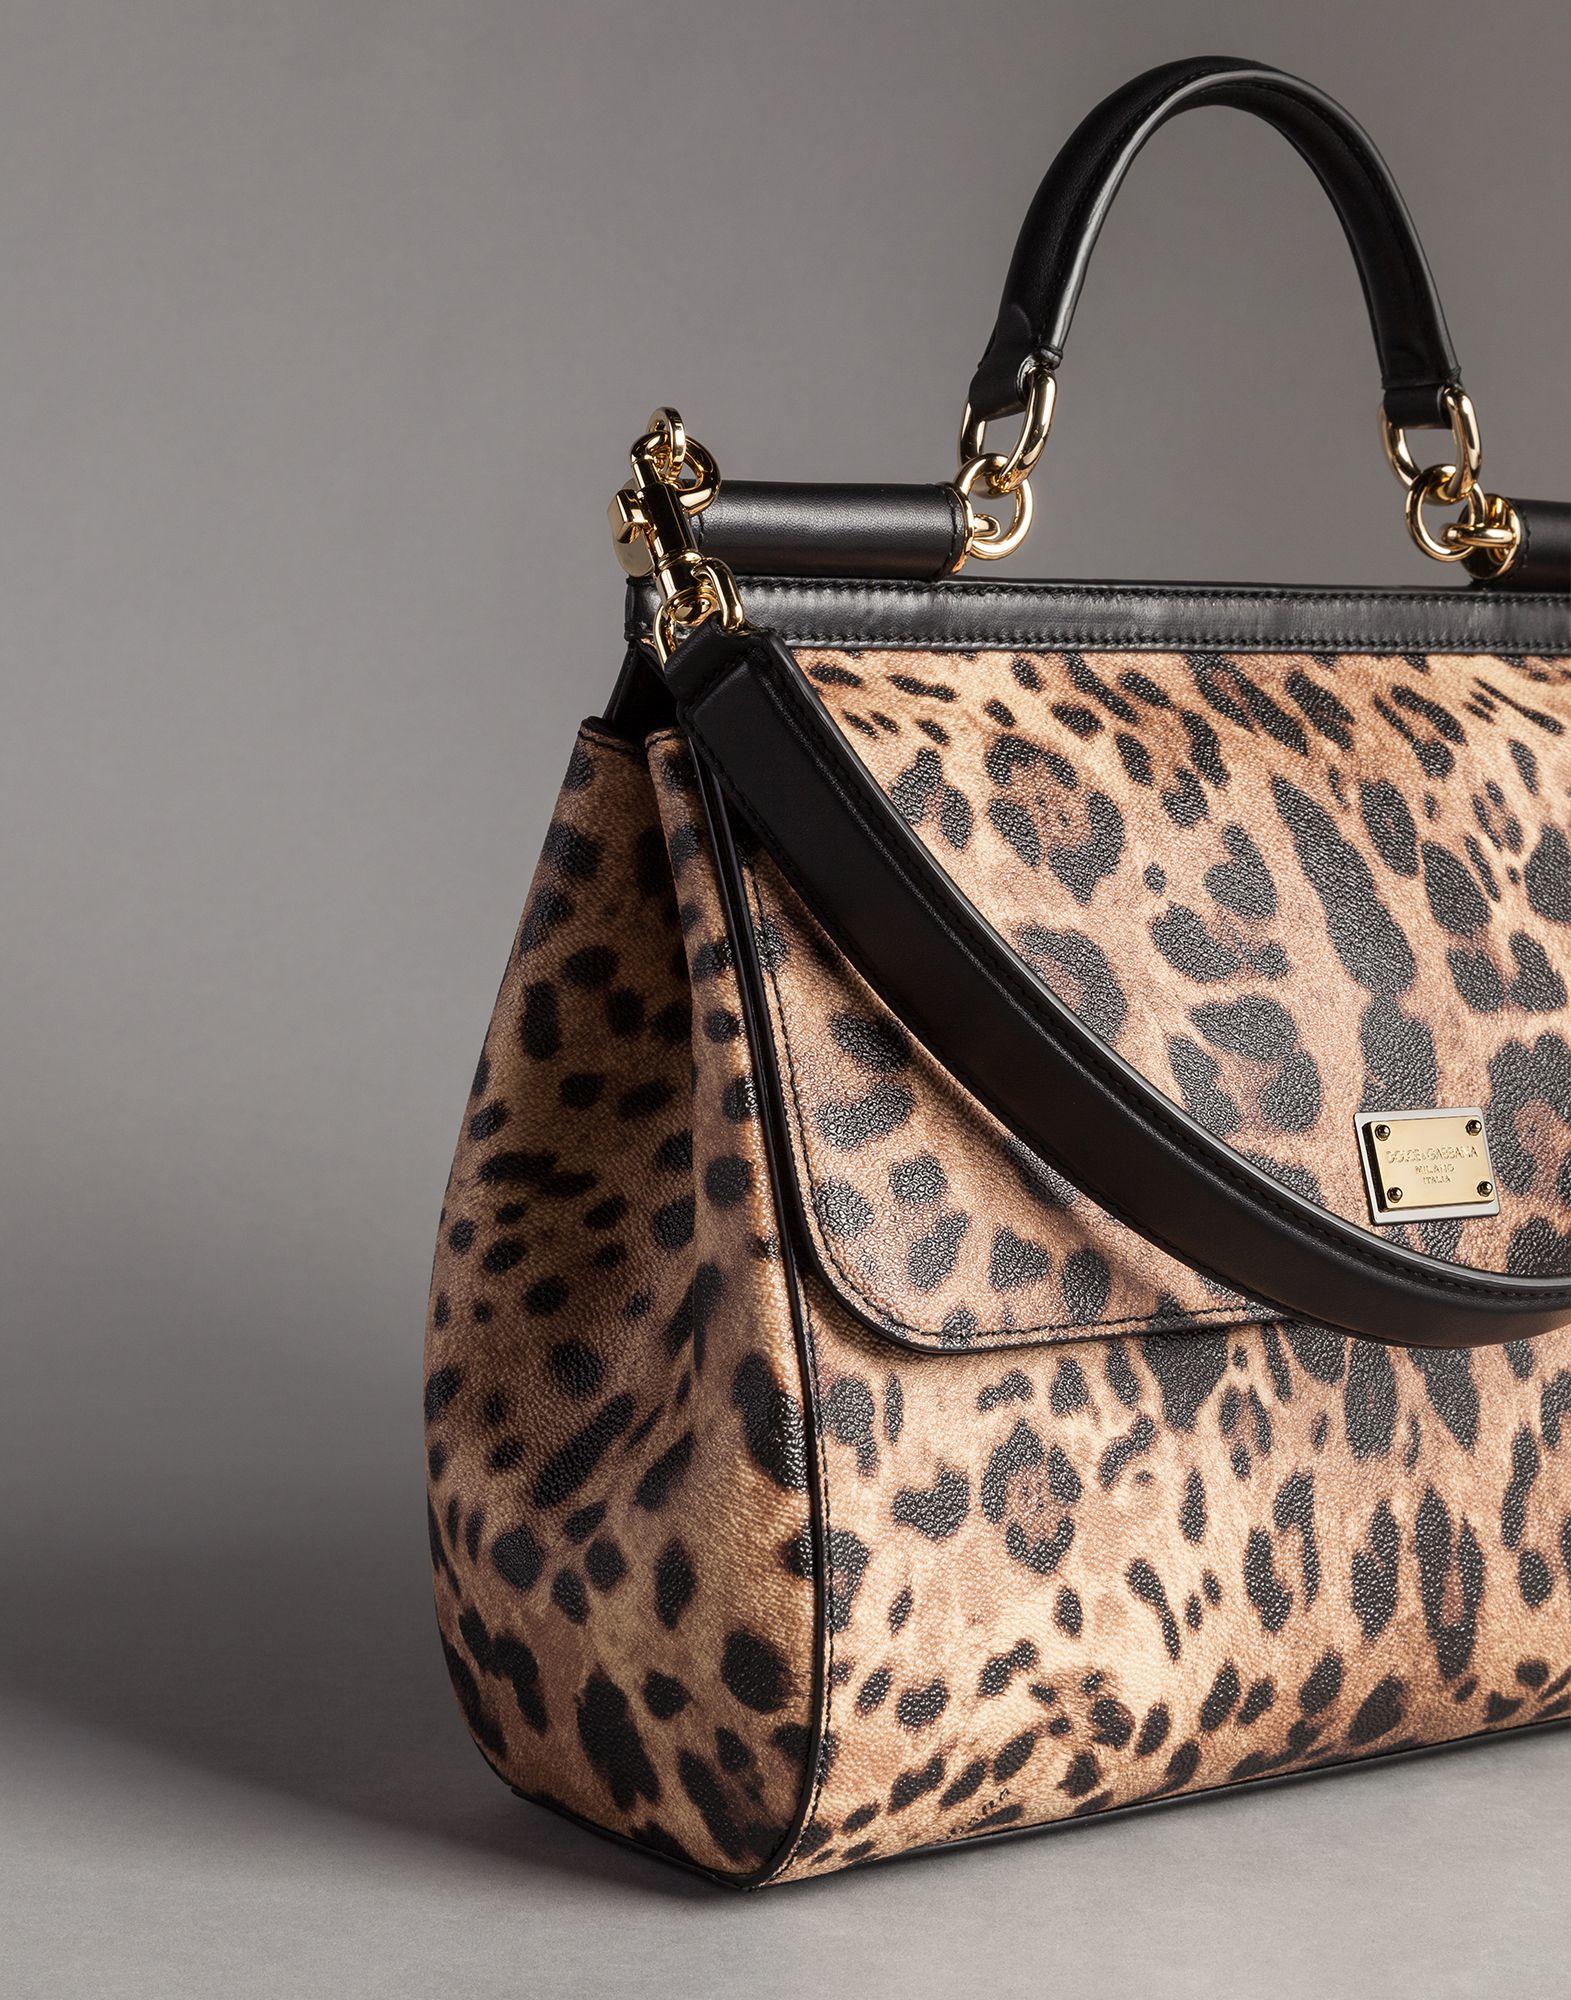 bdf5fcdd479d Lyst - Dolce   Gabbana Sicily Leopard-Print Tote in Brown